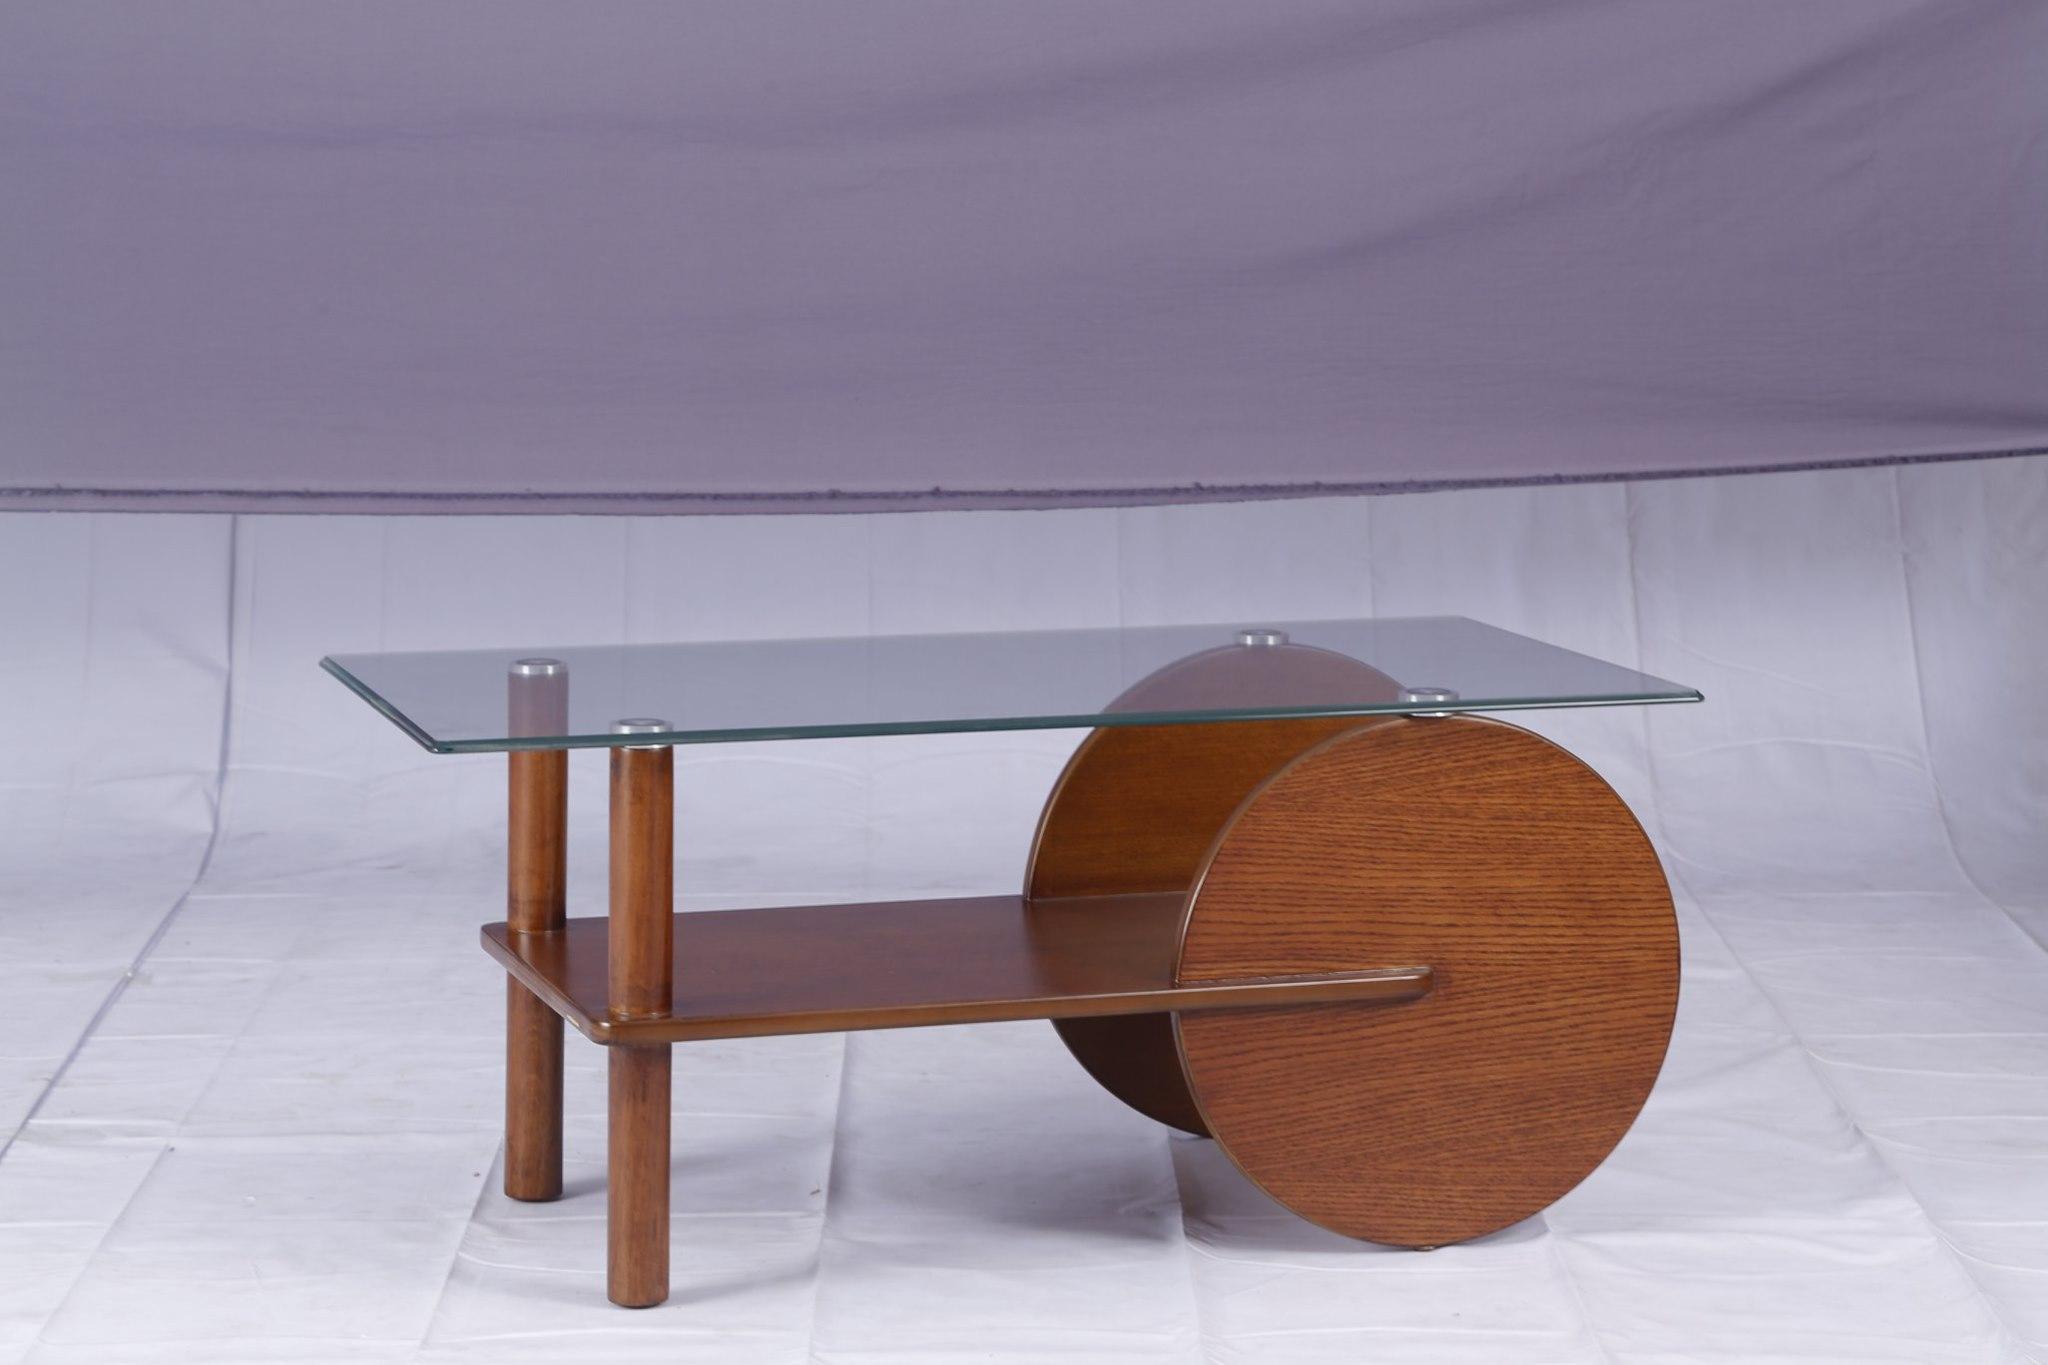 New Stylish Wooden Center Table C-361 Malaysian process wood